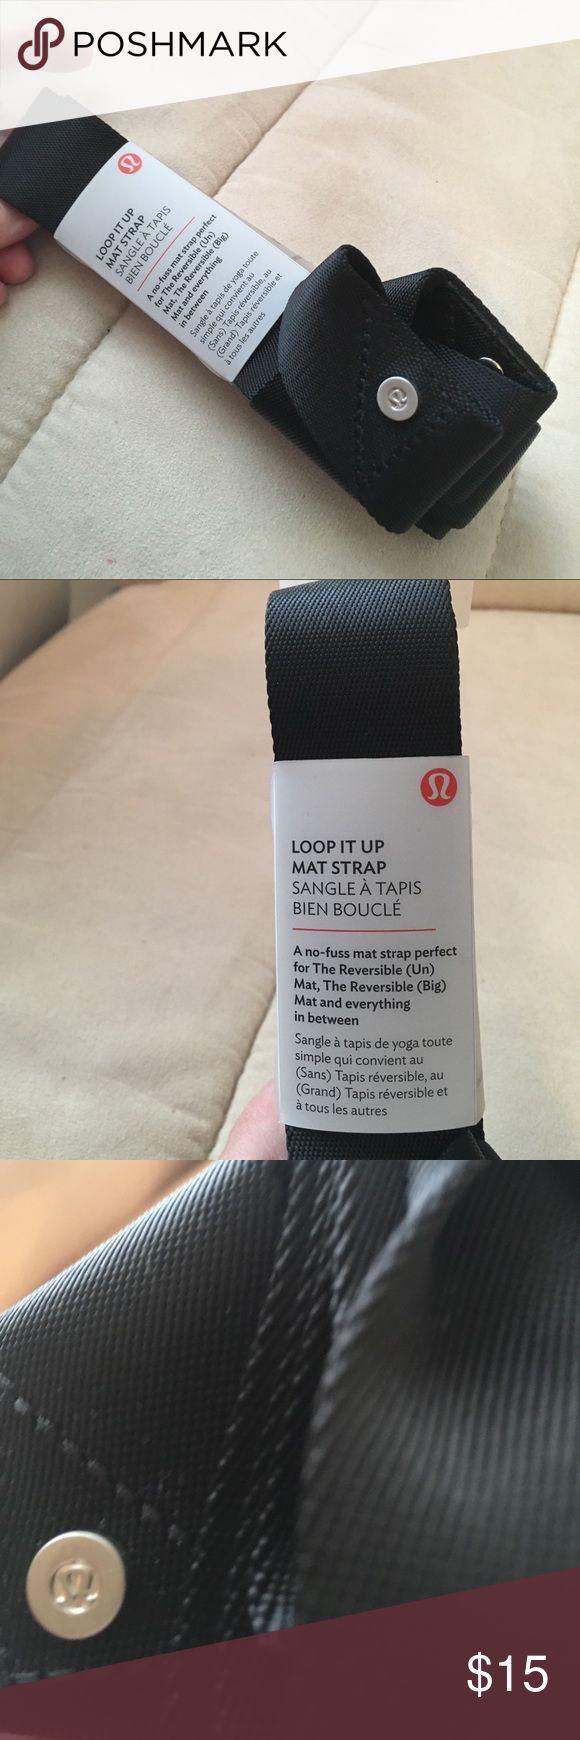 lululemon Mat Strap. NWT's. Yoga strap for Mat in Black. lululemon athletica Accessories